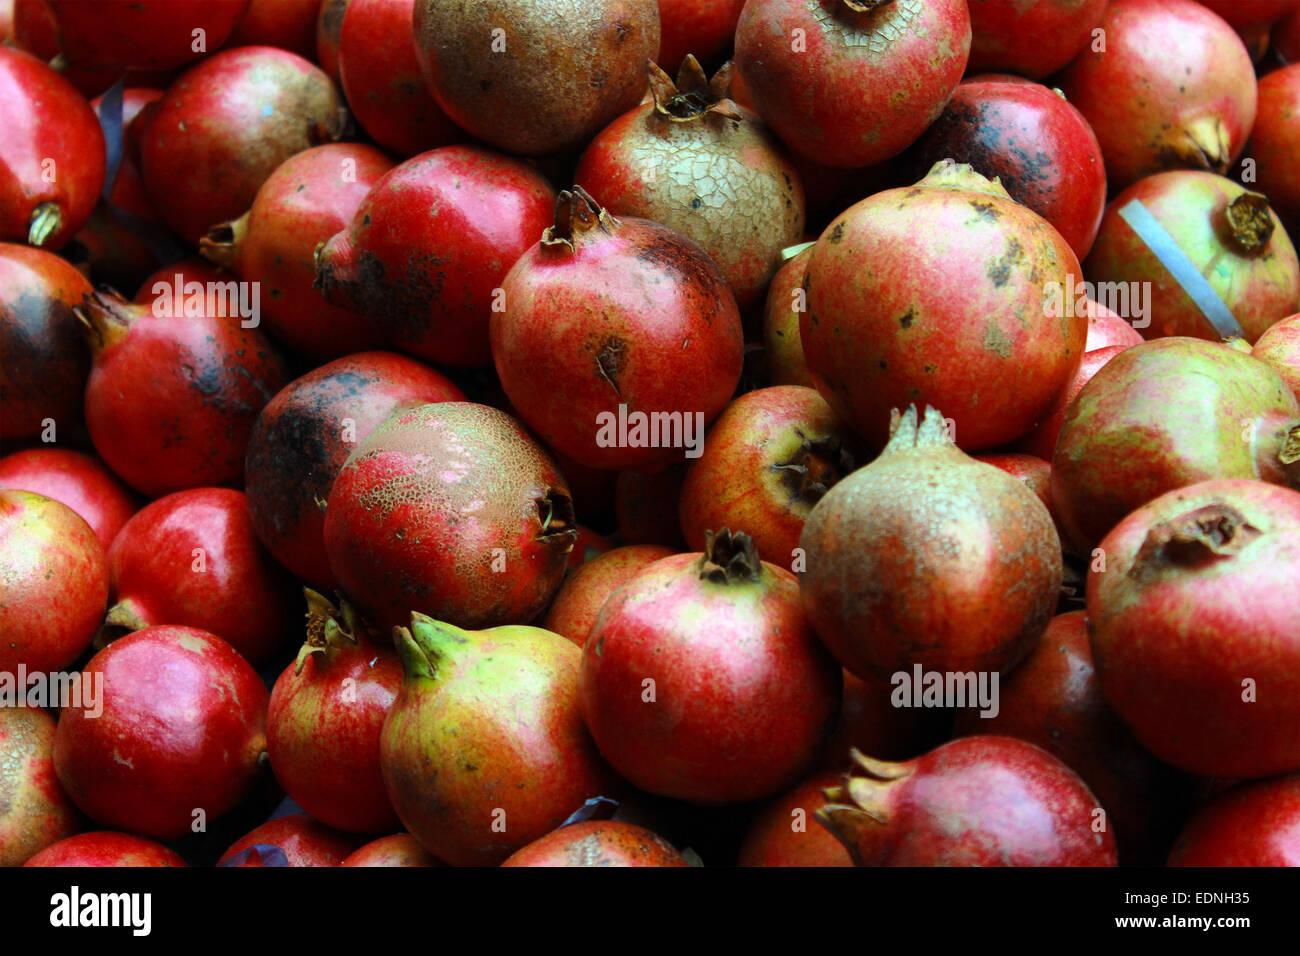 Anar, anardana, antioxydant, antioxydants, se concentrer, Crimson, dense, le régime alimentaire, manger, comestibles, Photo Stock